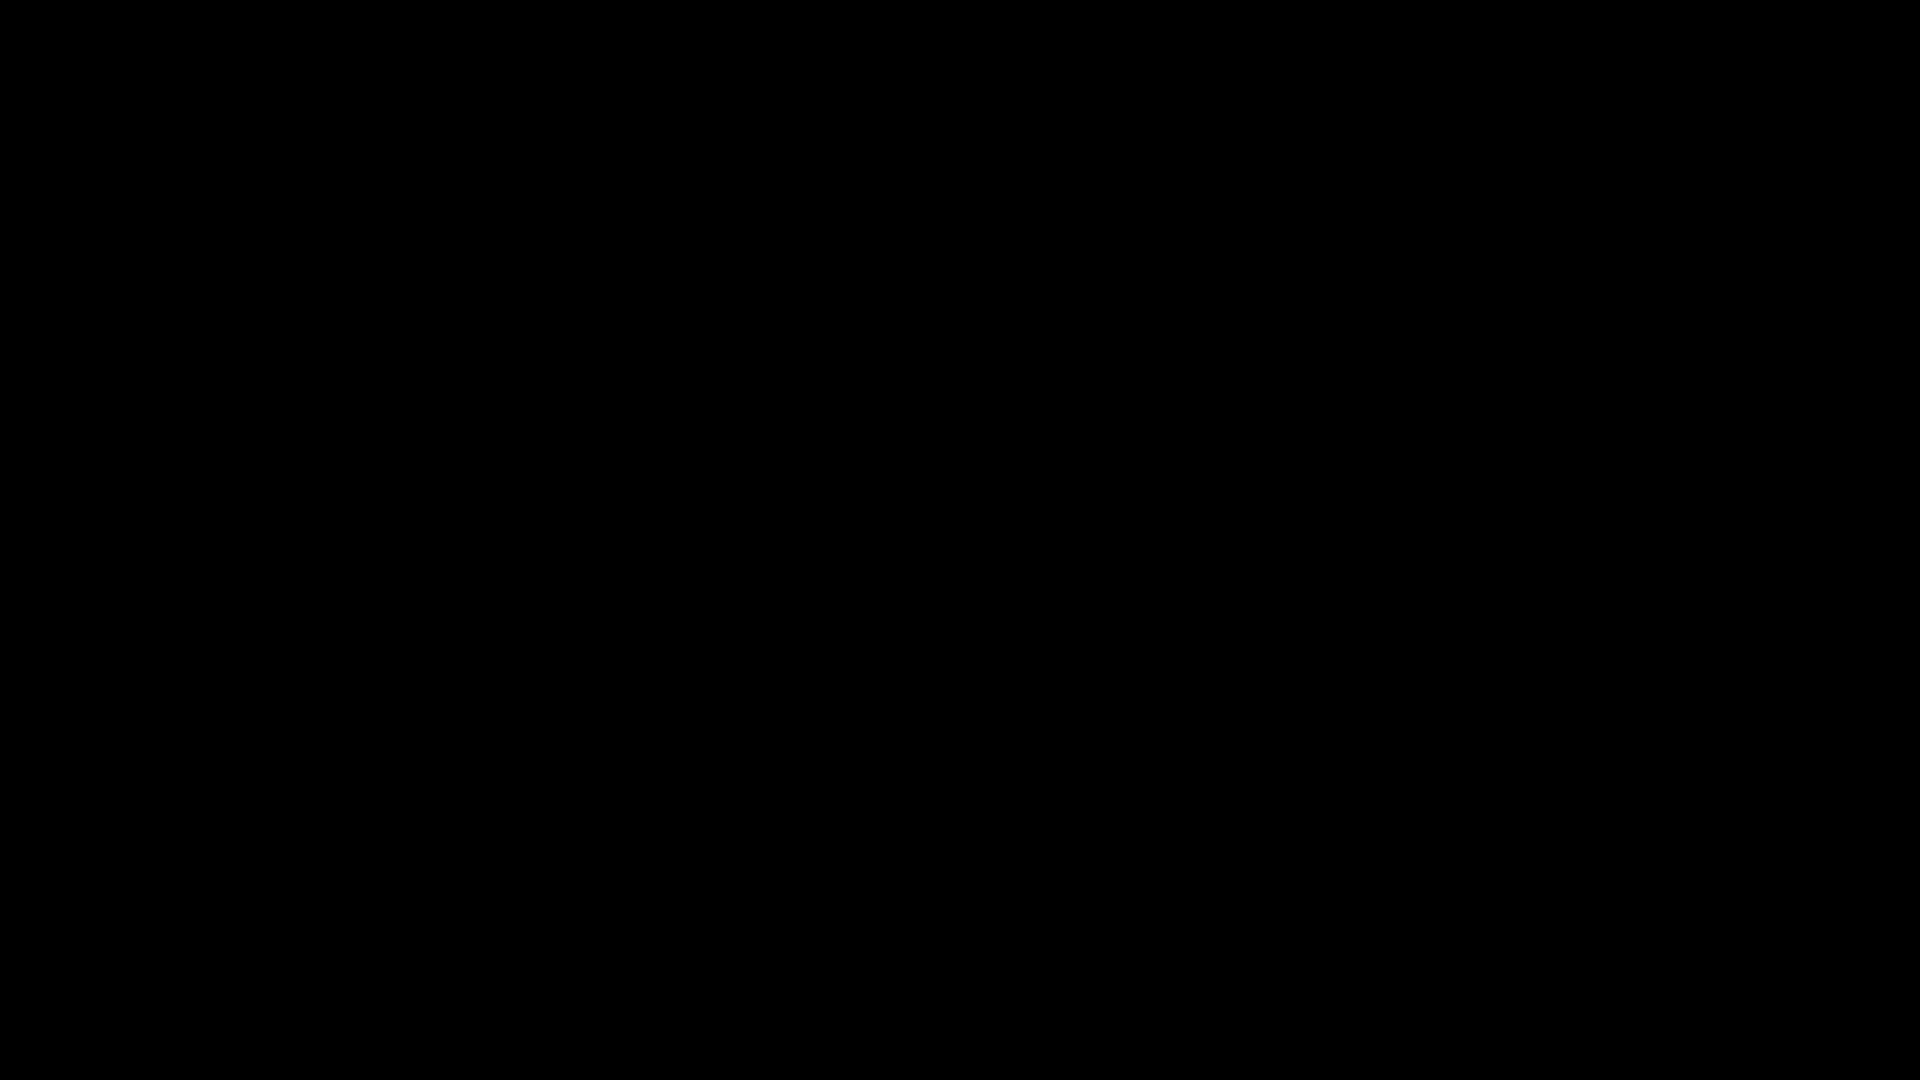 skyrimmods, skyrimporn, Project ENB + NobleSkyrimMod (NSM) GIFs